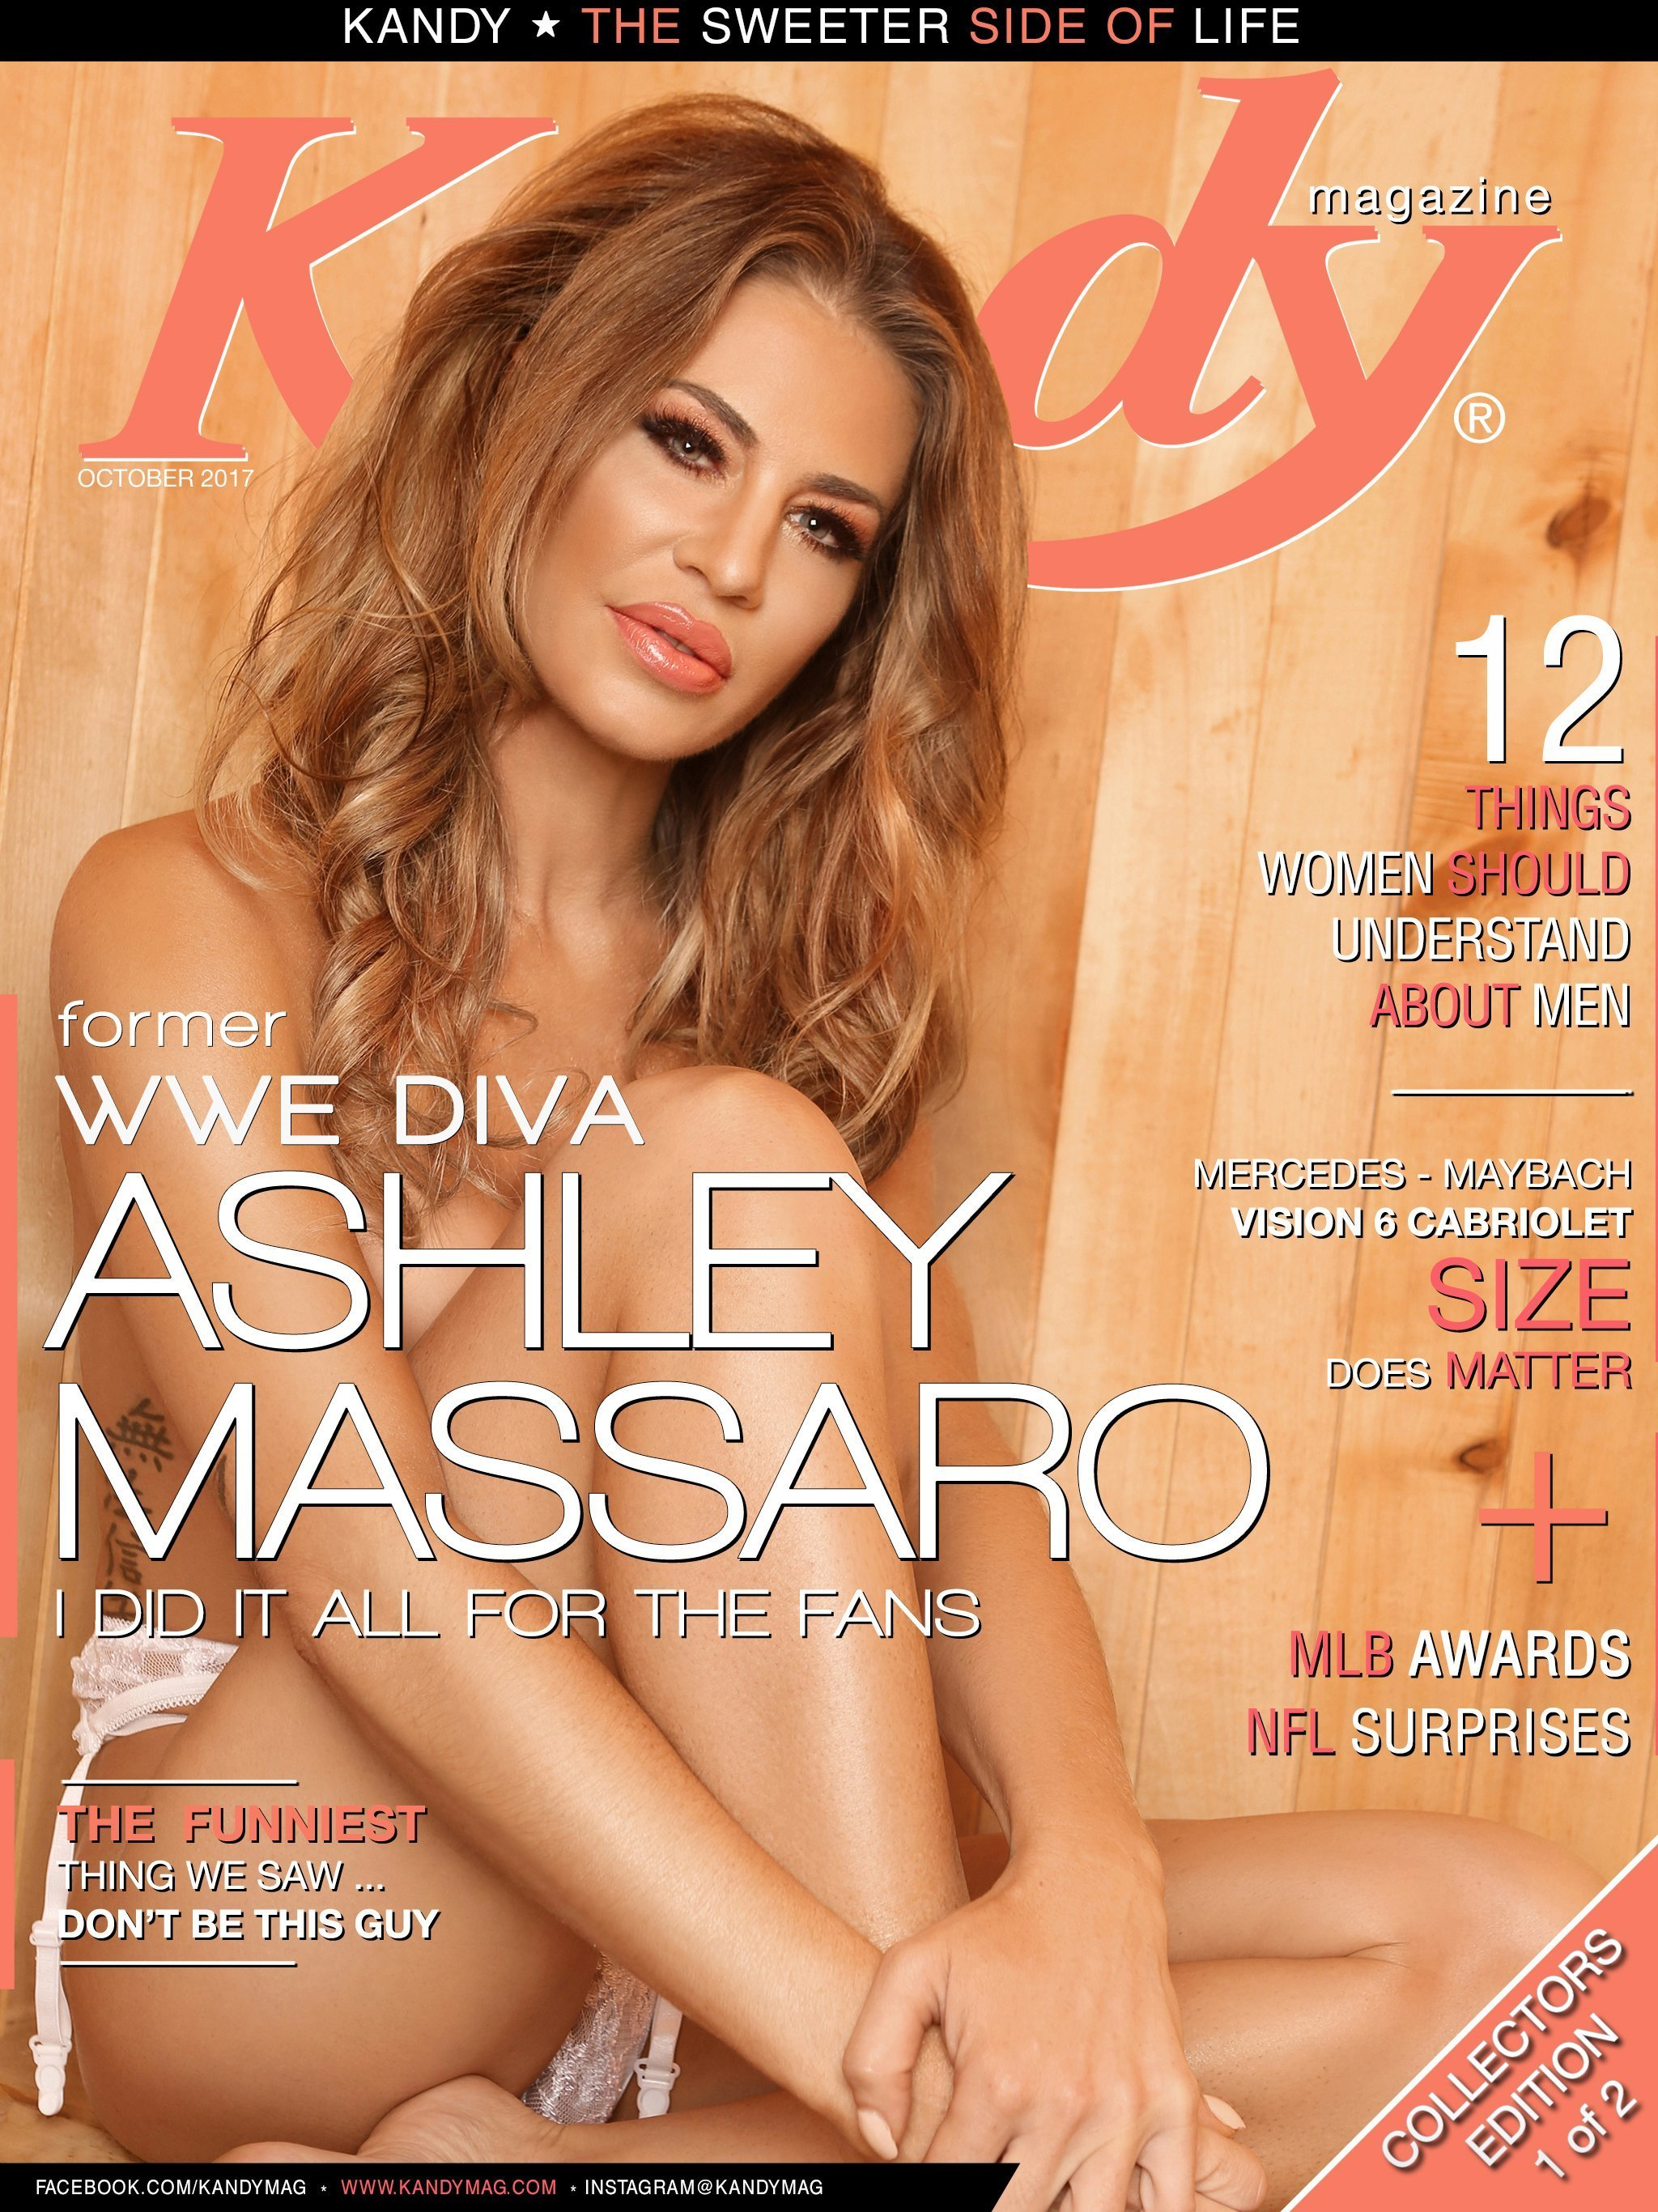 October 2017 Issue featuring former WWE Diva Ashley Massaro